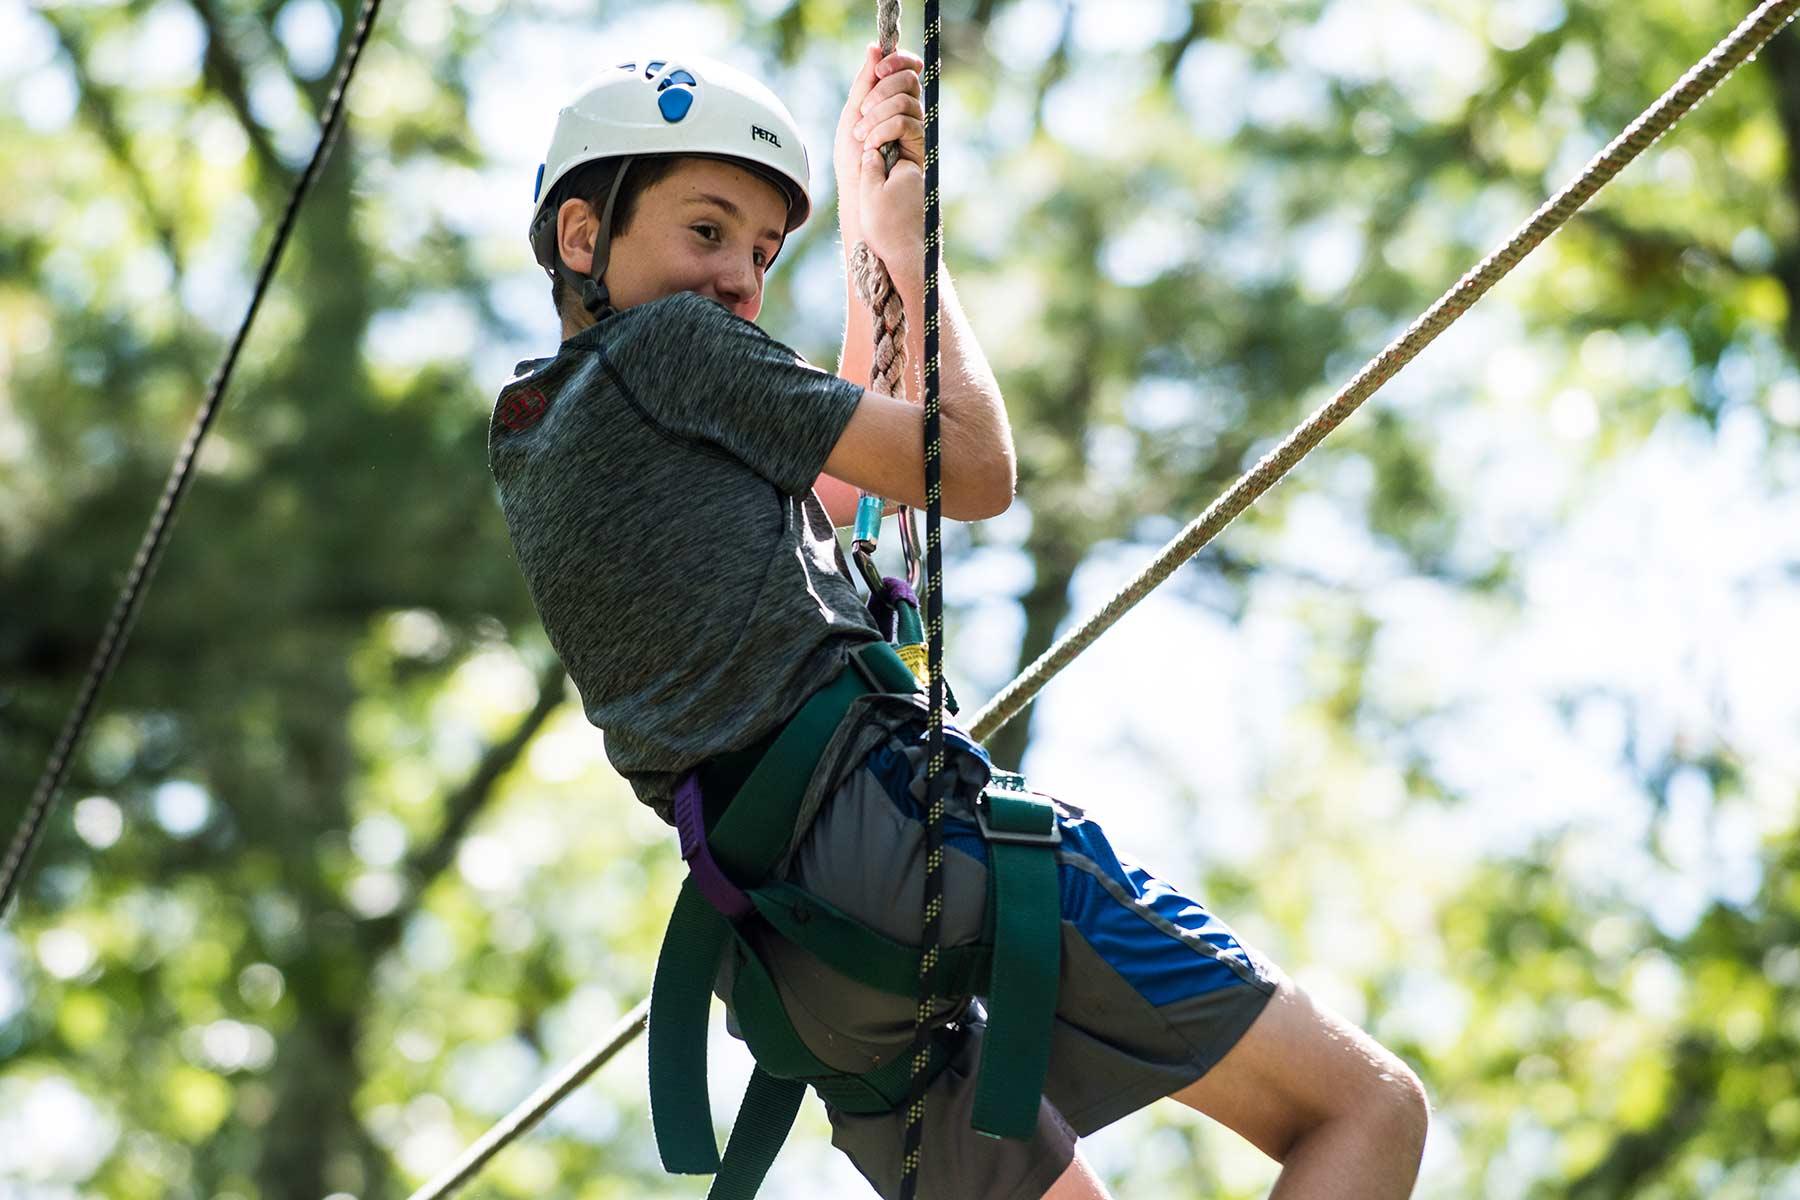 climbing at Camp Ramsbottom